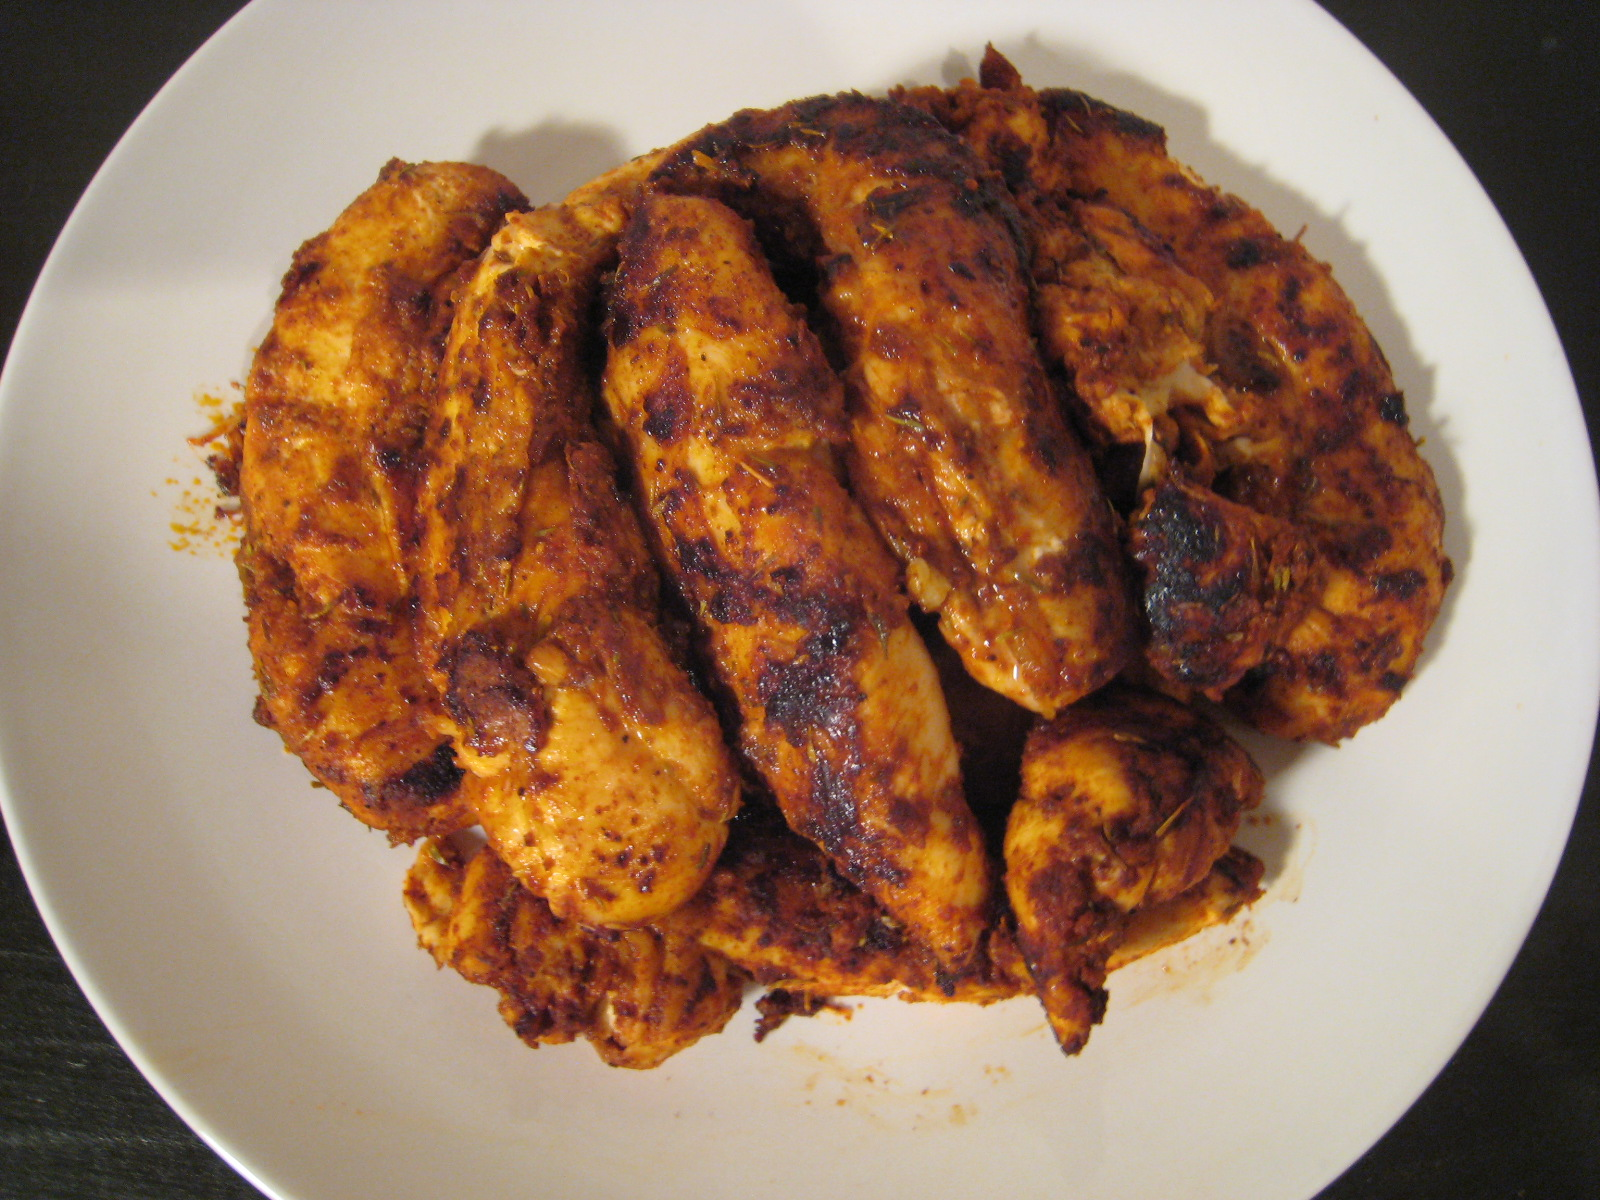 jostage kitchen: Recipe for Cajun Blackened Chicken Easy Recipe